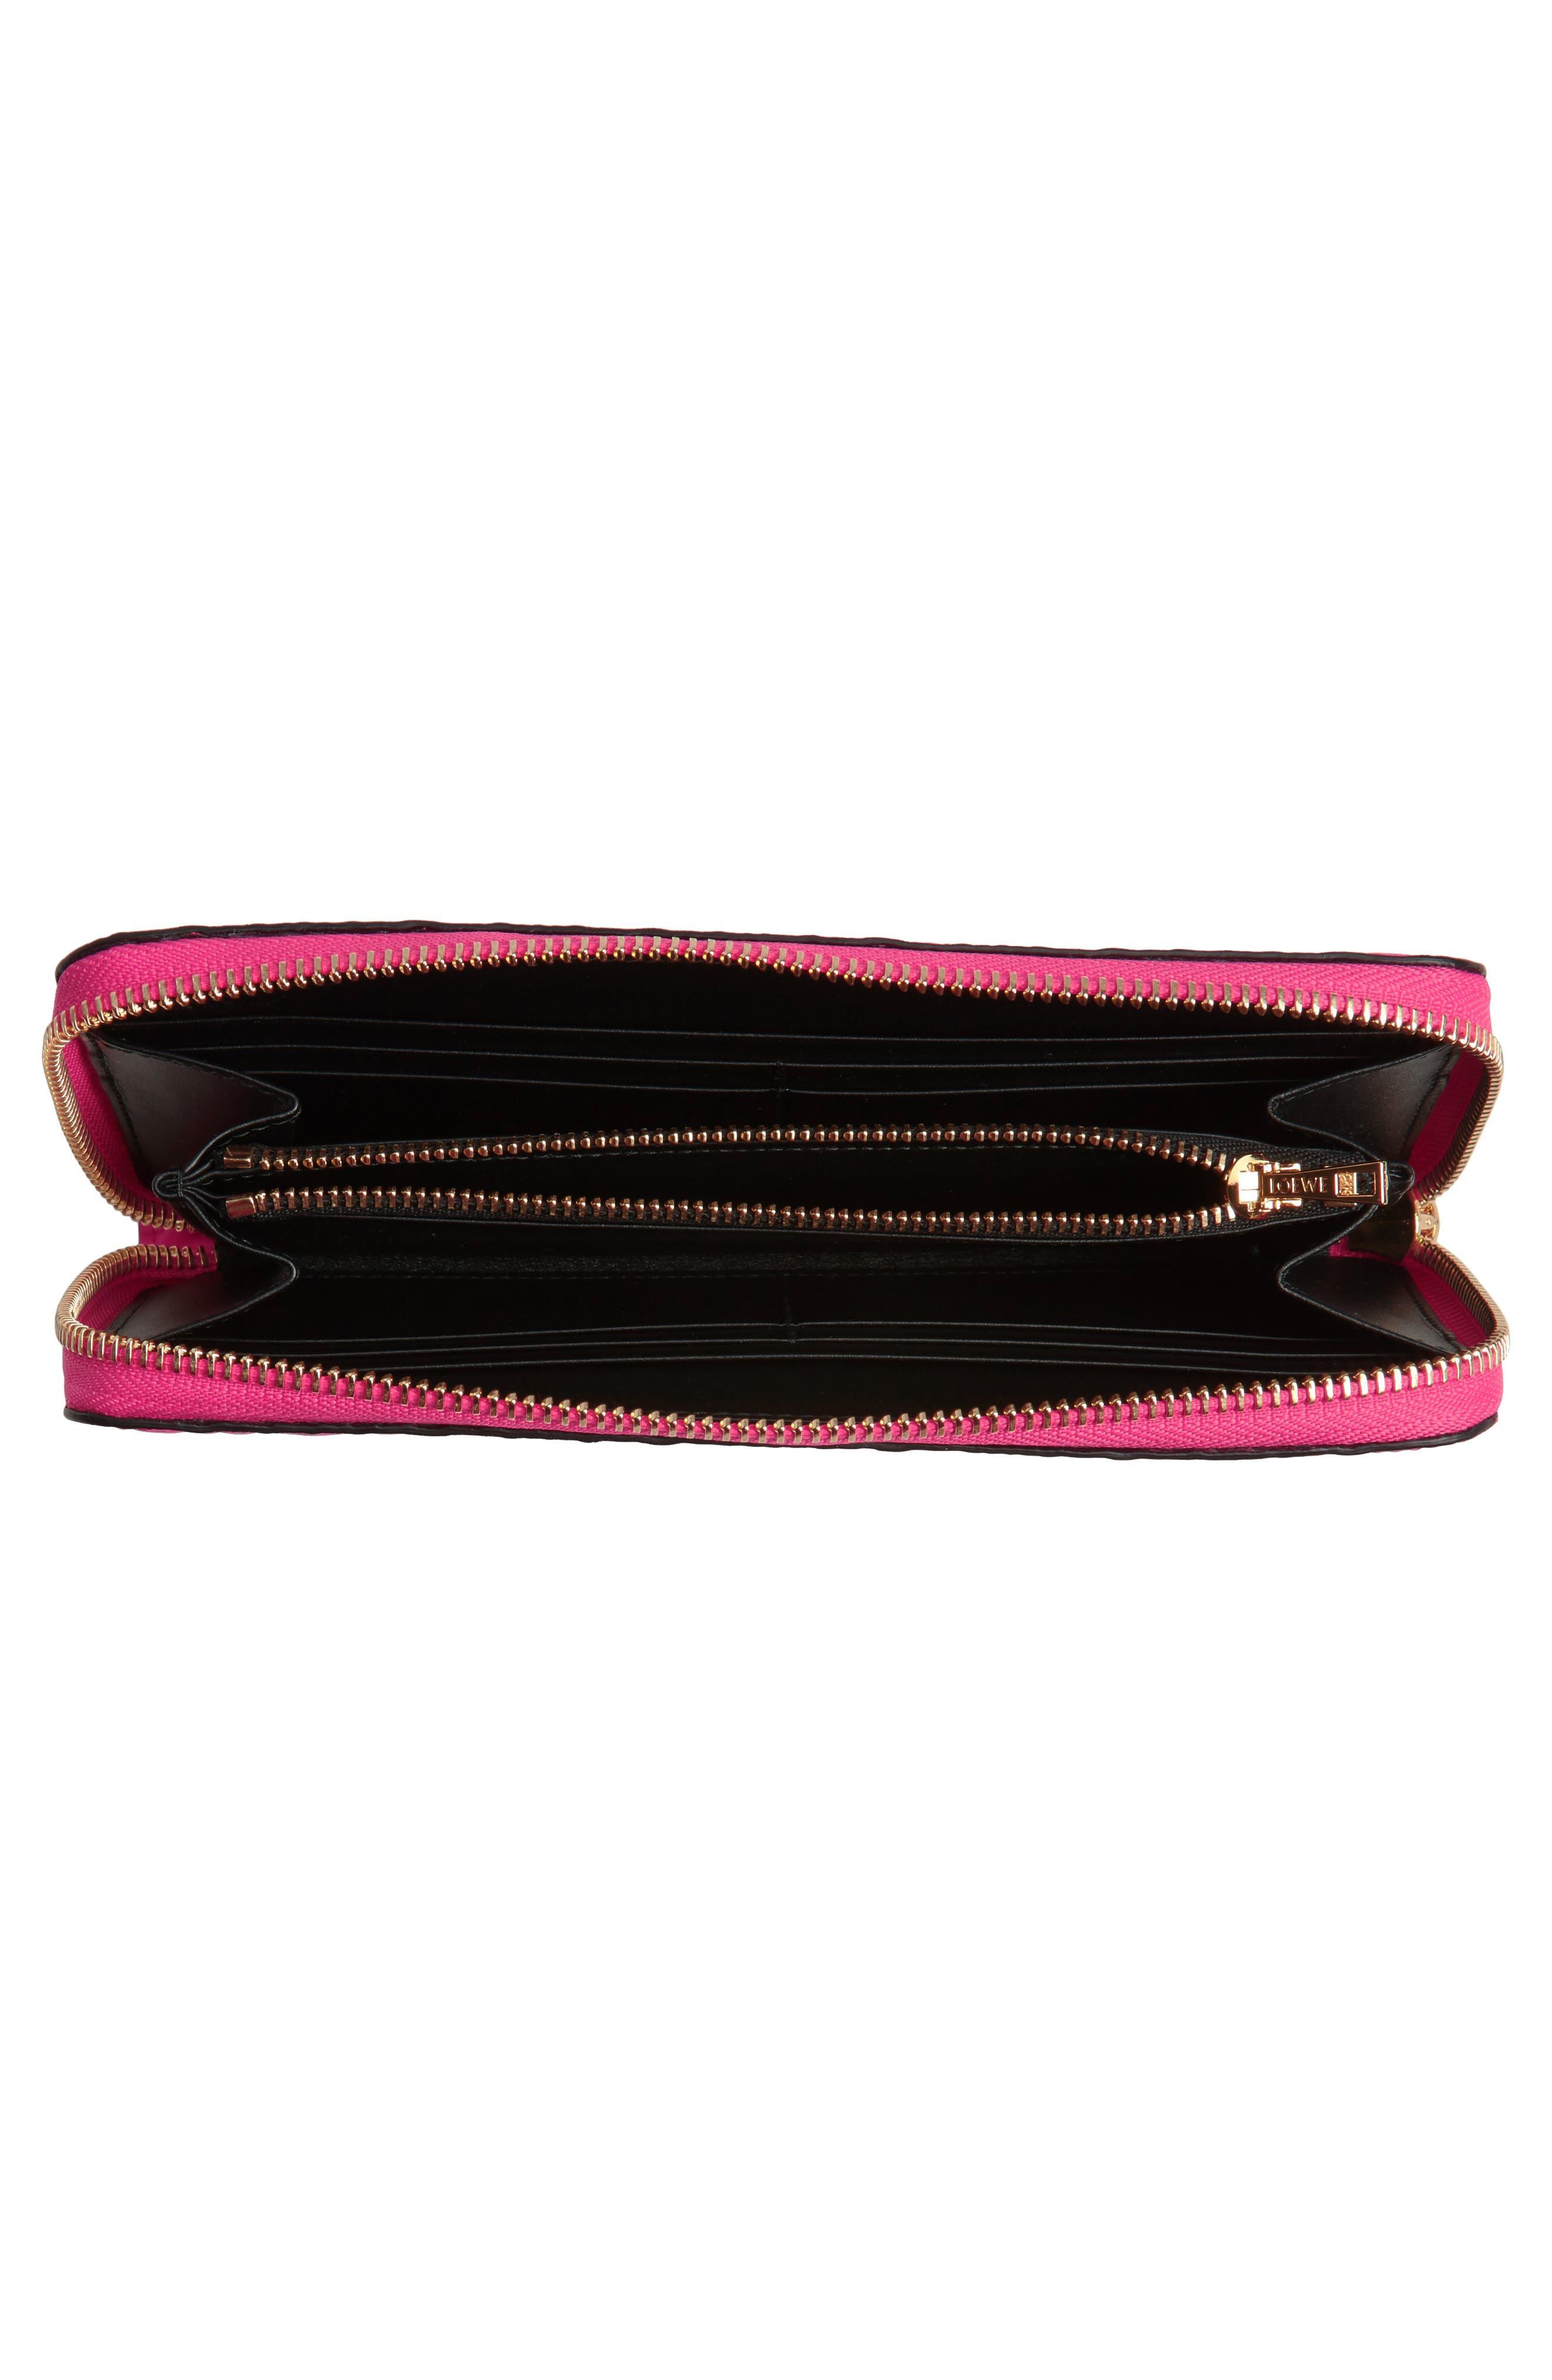 Leather Zip Around Wallet,                             Alternate thumbnail 2, color,                             Shocking Pink